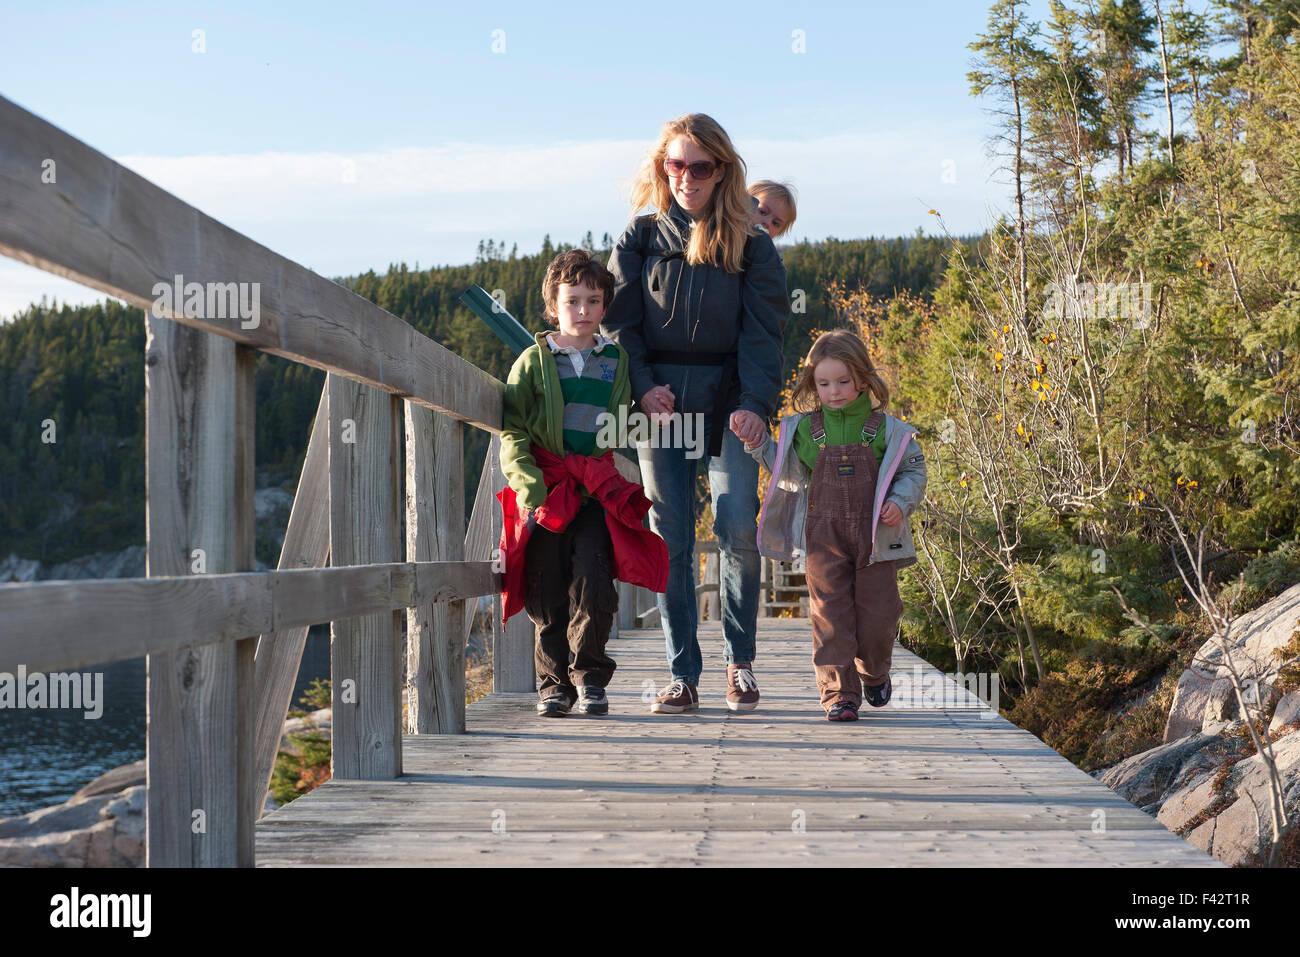 Mother and three children enjoying nature walk - Stock Image